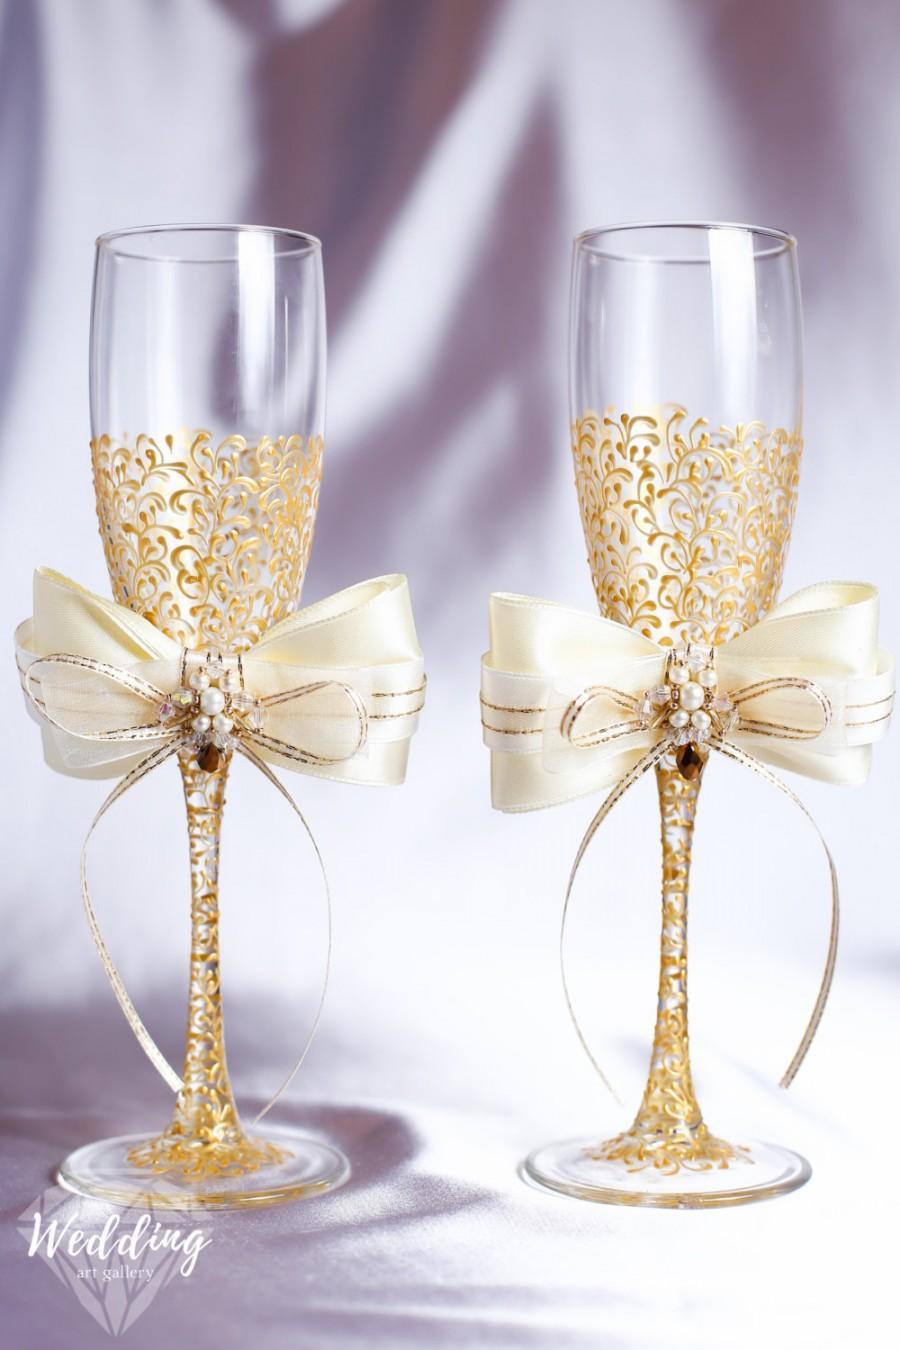 Compelling Personalized Wedding Flutes Wedding Champagne Glasses Champagne Flutestoasting Flutes G Champagne Flutes Wedding Flutes Set Personalized Wedding Flutes Wedding Champagne Glasses Champagne wedding Wedding Champagne Flutes